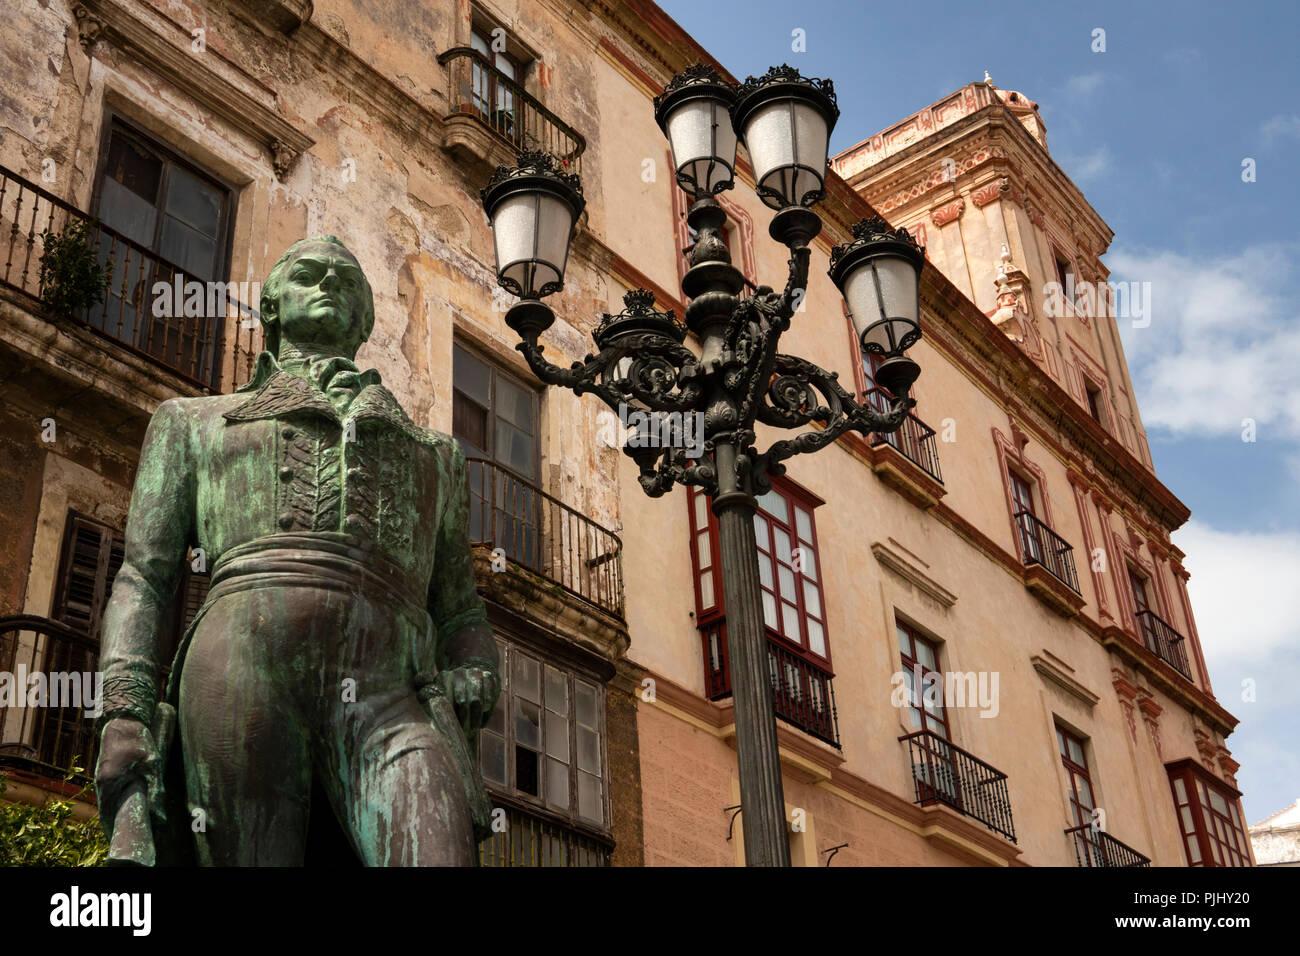 L'Espagne, Cadix, Statue de Francisco de Miranda, héros de l'Indépendance américaine, est mort à Cadix 1816 Banque D'Images